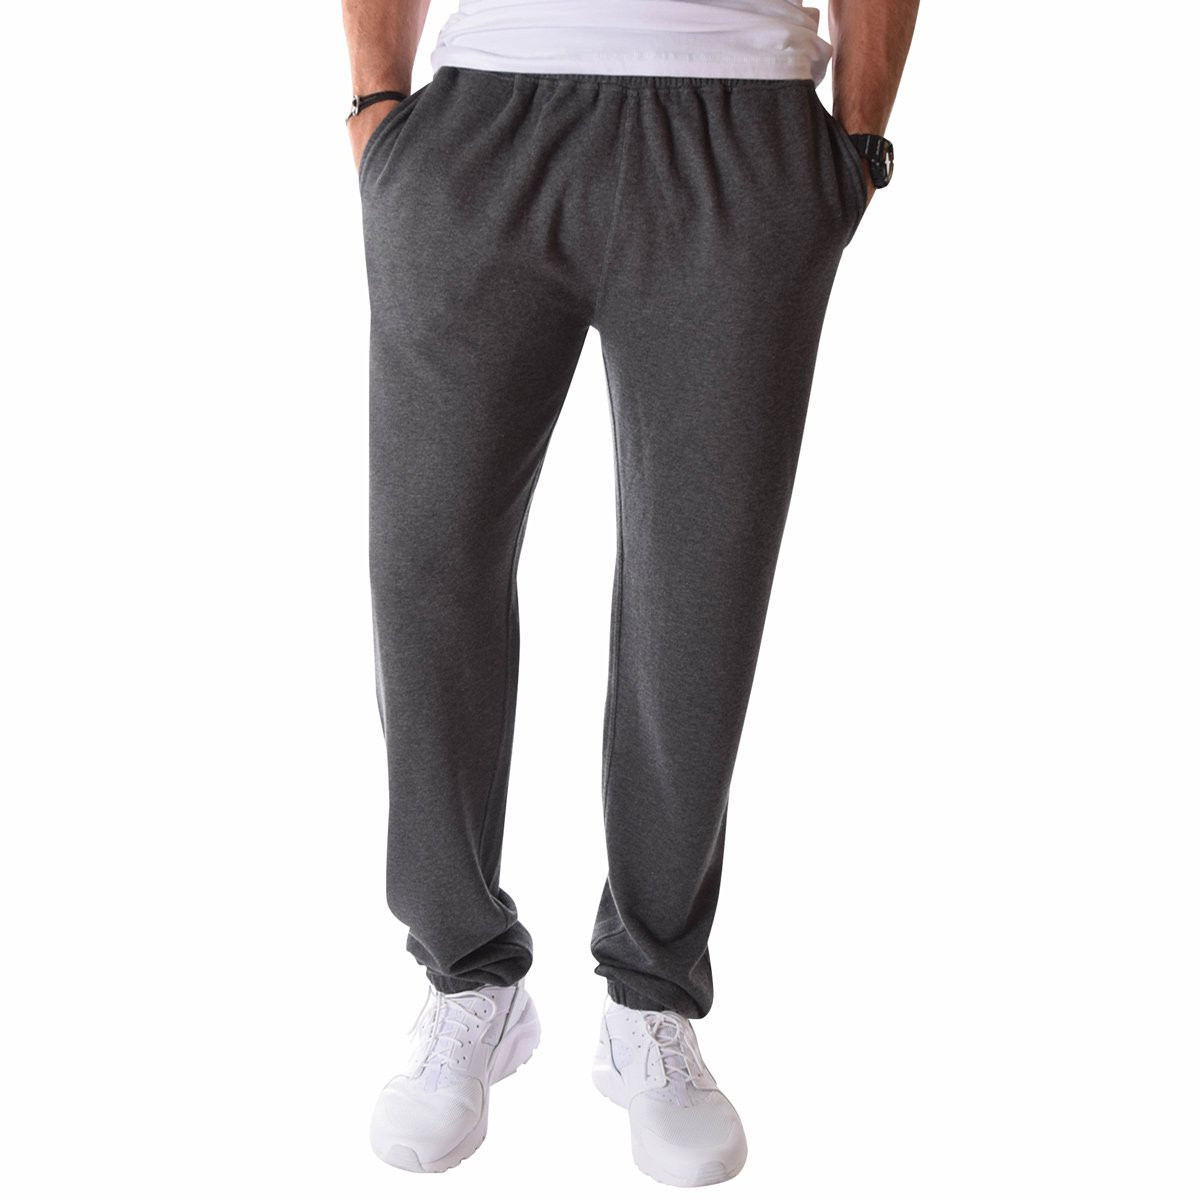 1d0c6065 Long inseam sweatpants men. Image 3. Image 4. See 3 more pictures